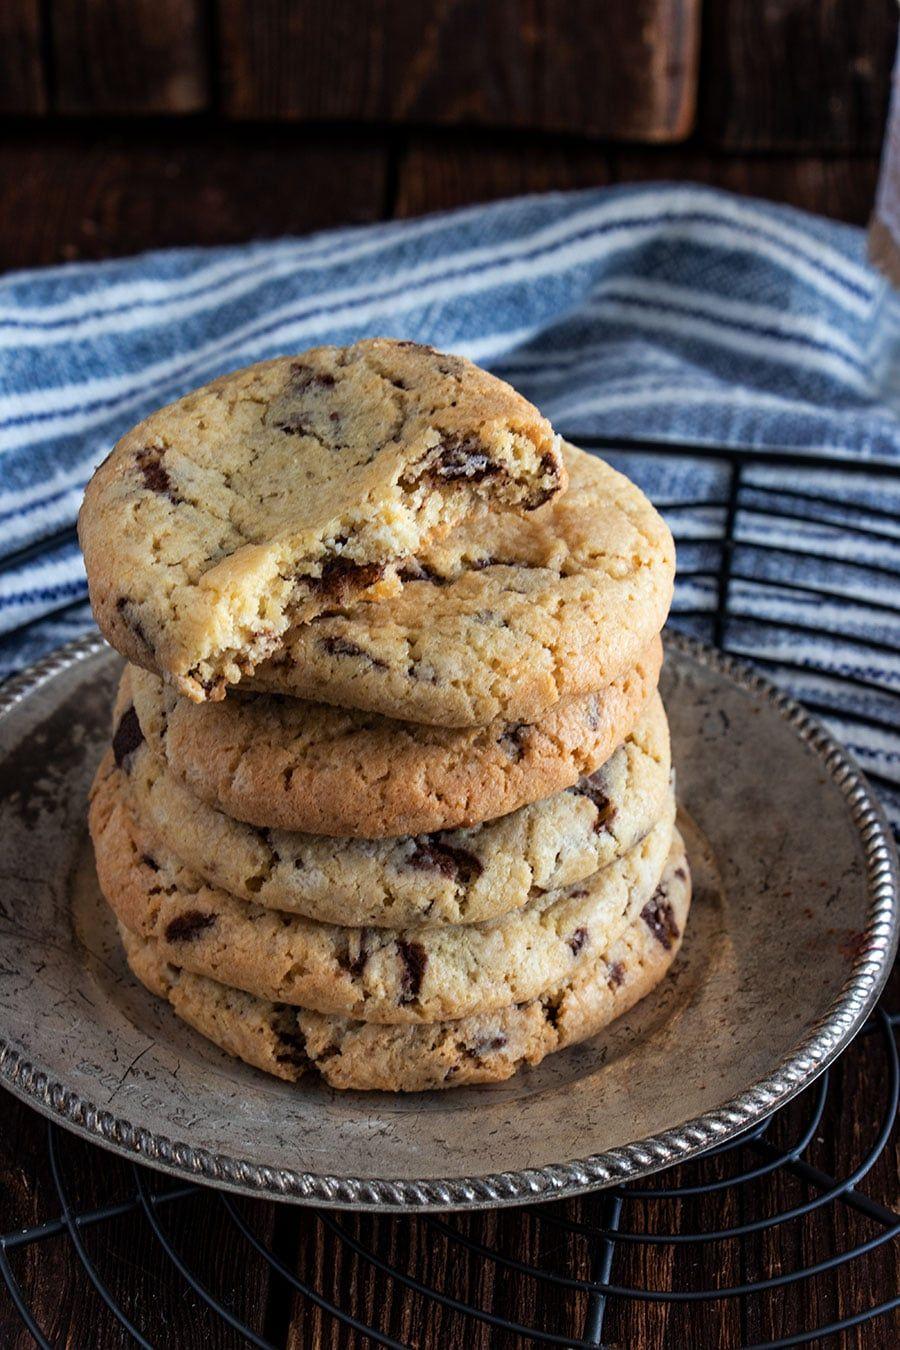 Weltbeste Lieblingscookies American Cookies Rezept Mit Schokolade Rezept Kekse Backen Rezept Cookies Rezept Vegane Kekse Rezept